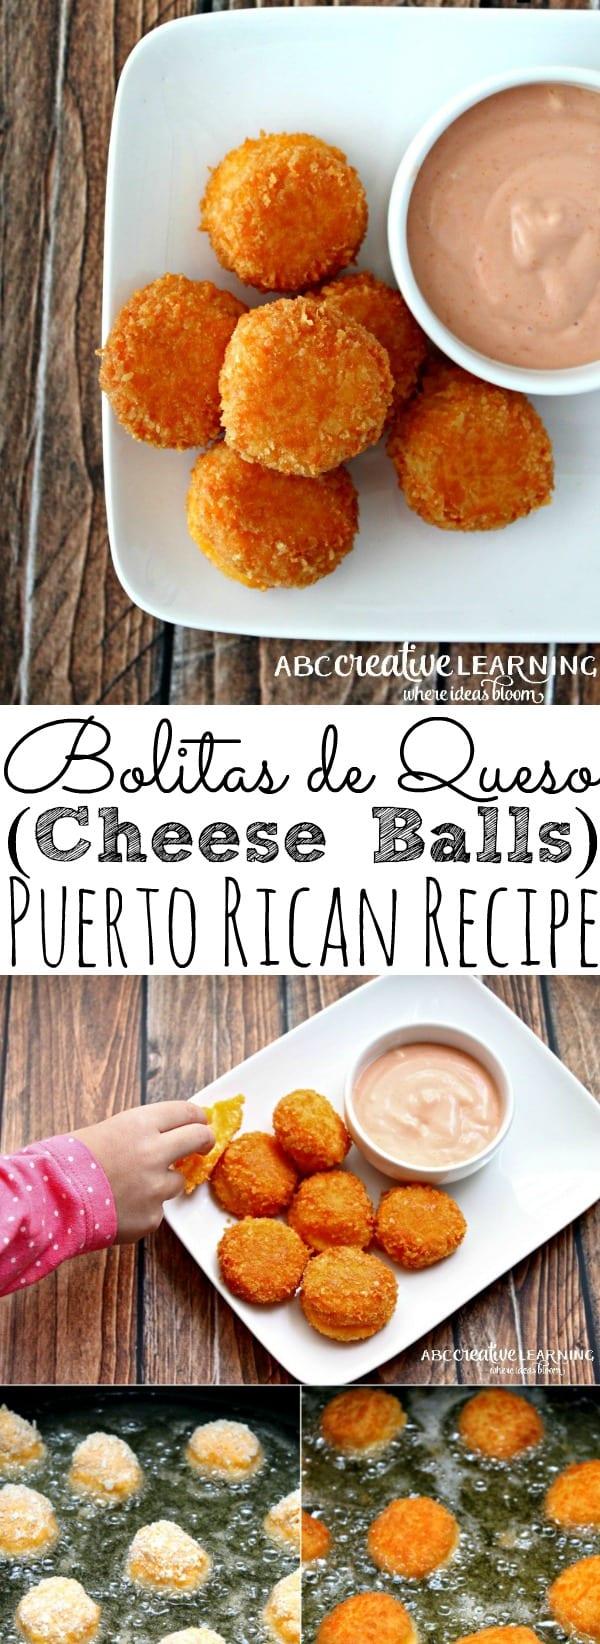 Bolitas de Queso Recipe (Cheese Balls) with Mayo Ketchup